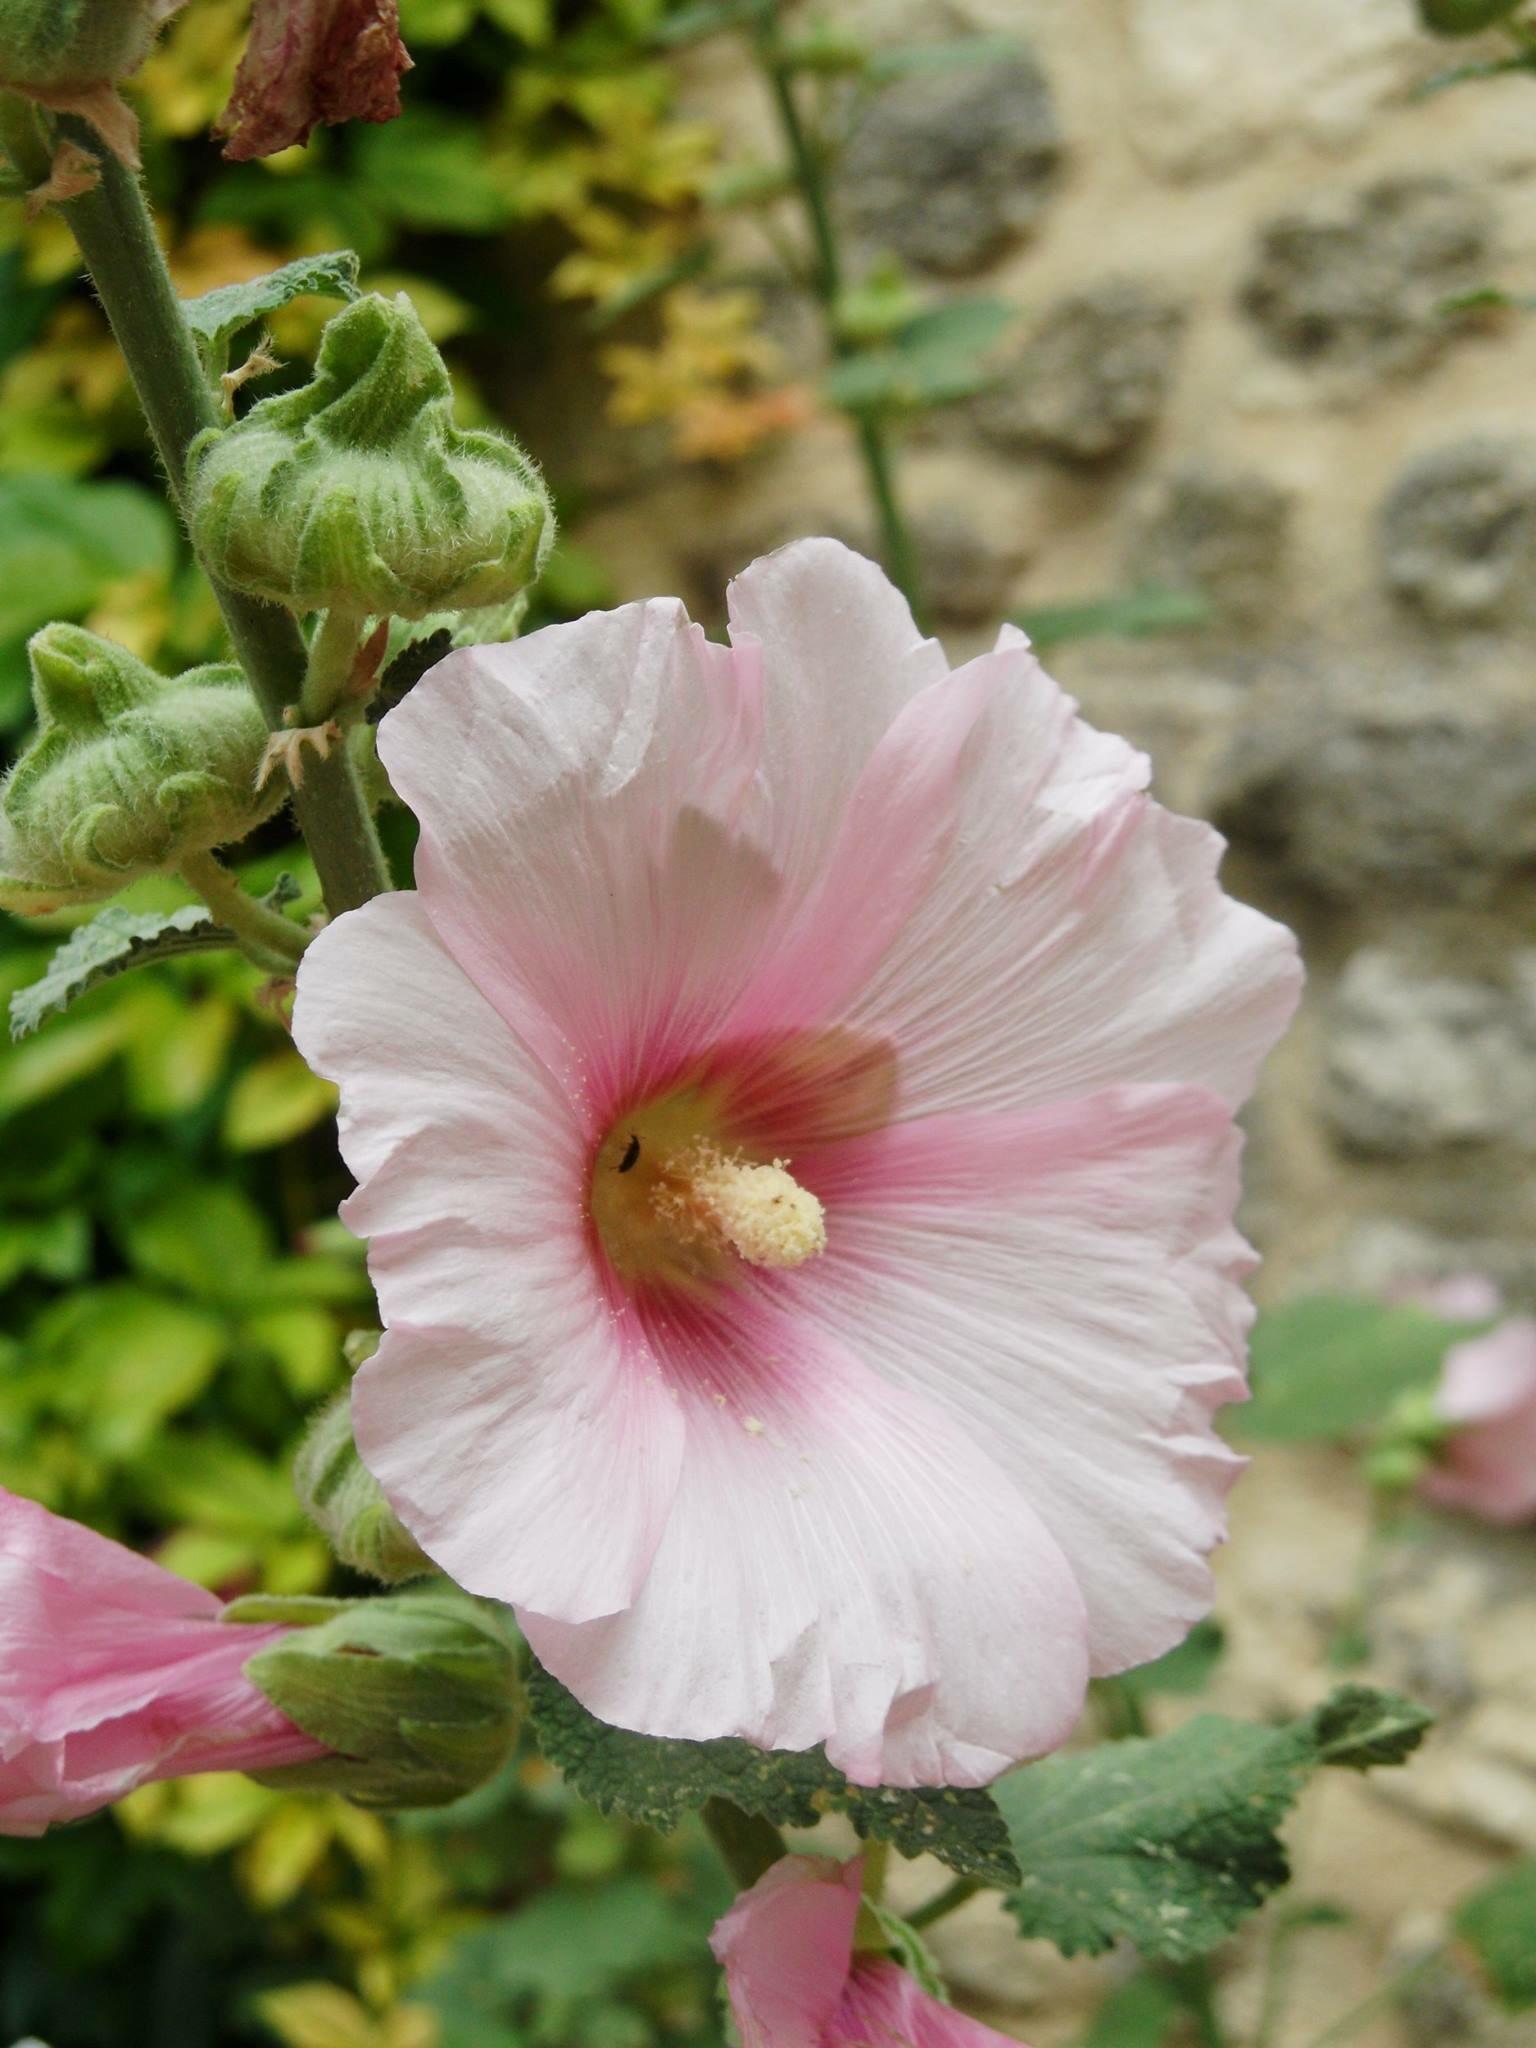 French rose by Lenneke4U